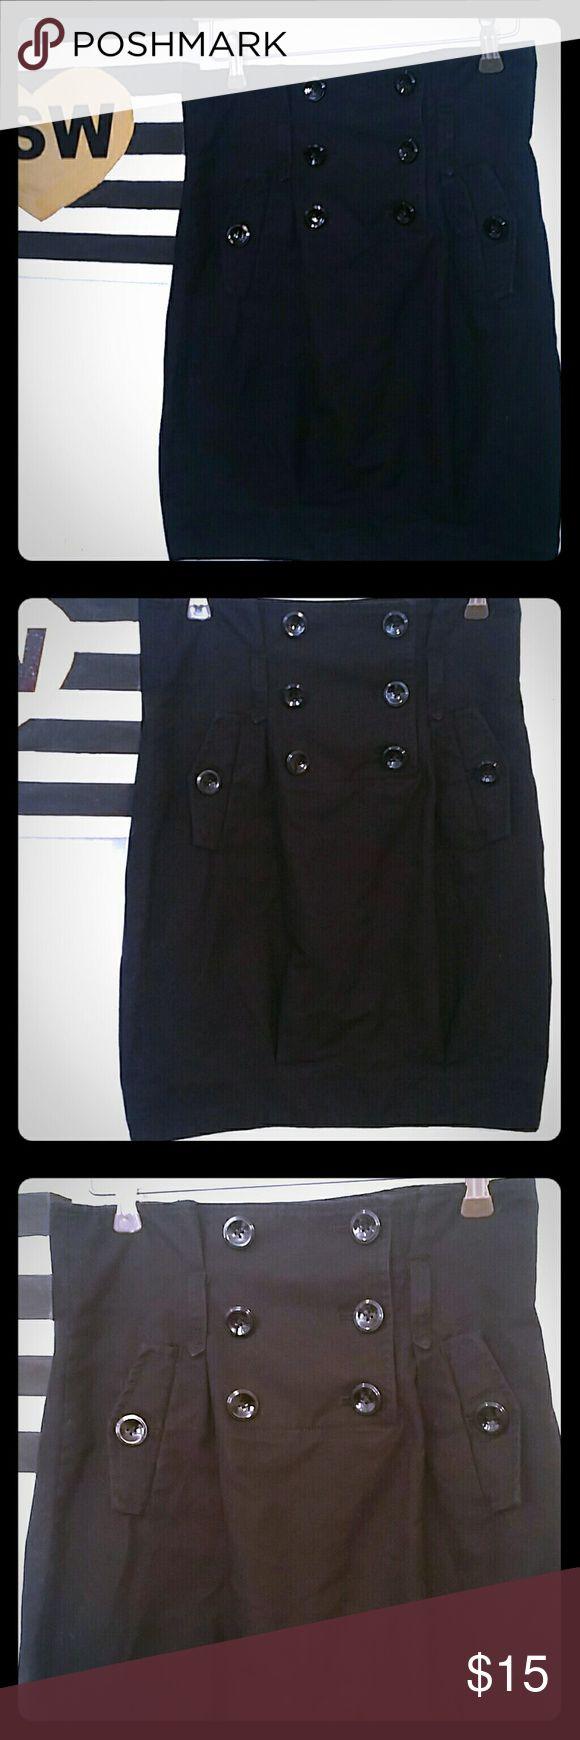 ARMANI EXCHANGE BUTTON BLACK SKIRT SIZE 0 ARMANI EXCHANGE BUTTON BLACK SKIRT SIZE 0 sold as is, in good pre-loved condition Armani Exchange Skirts Mini